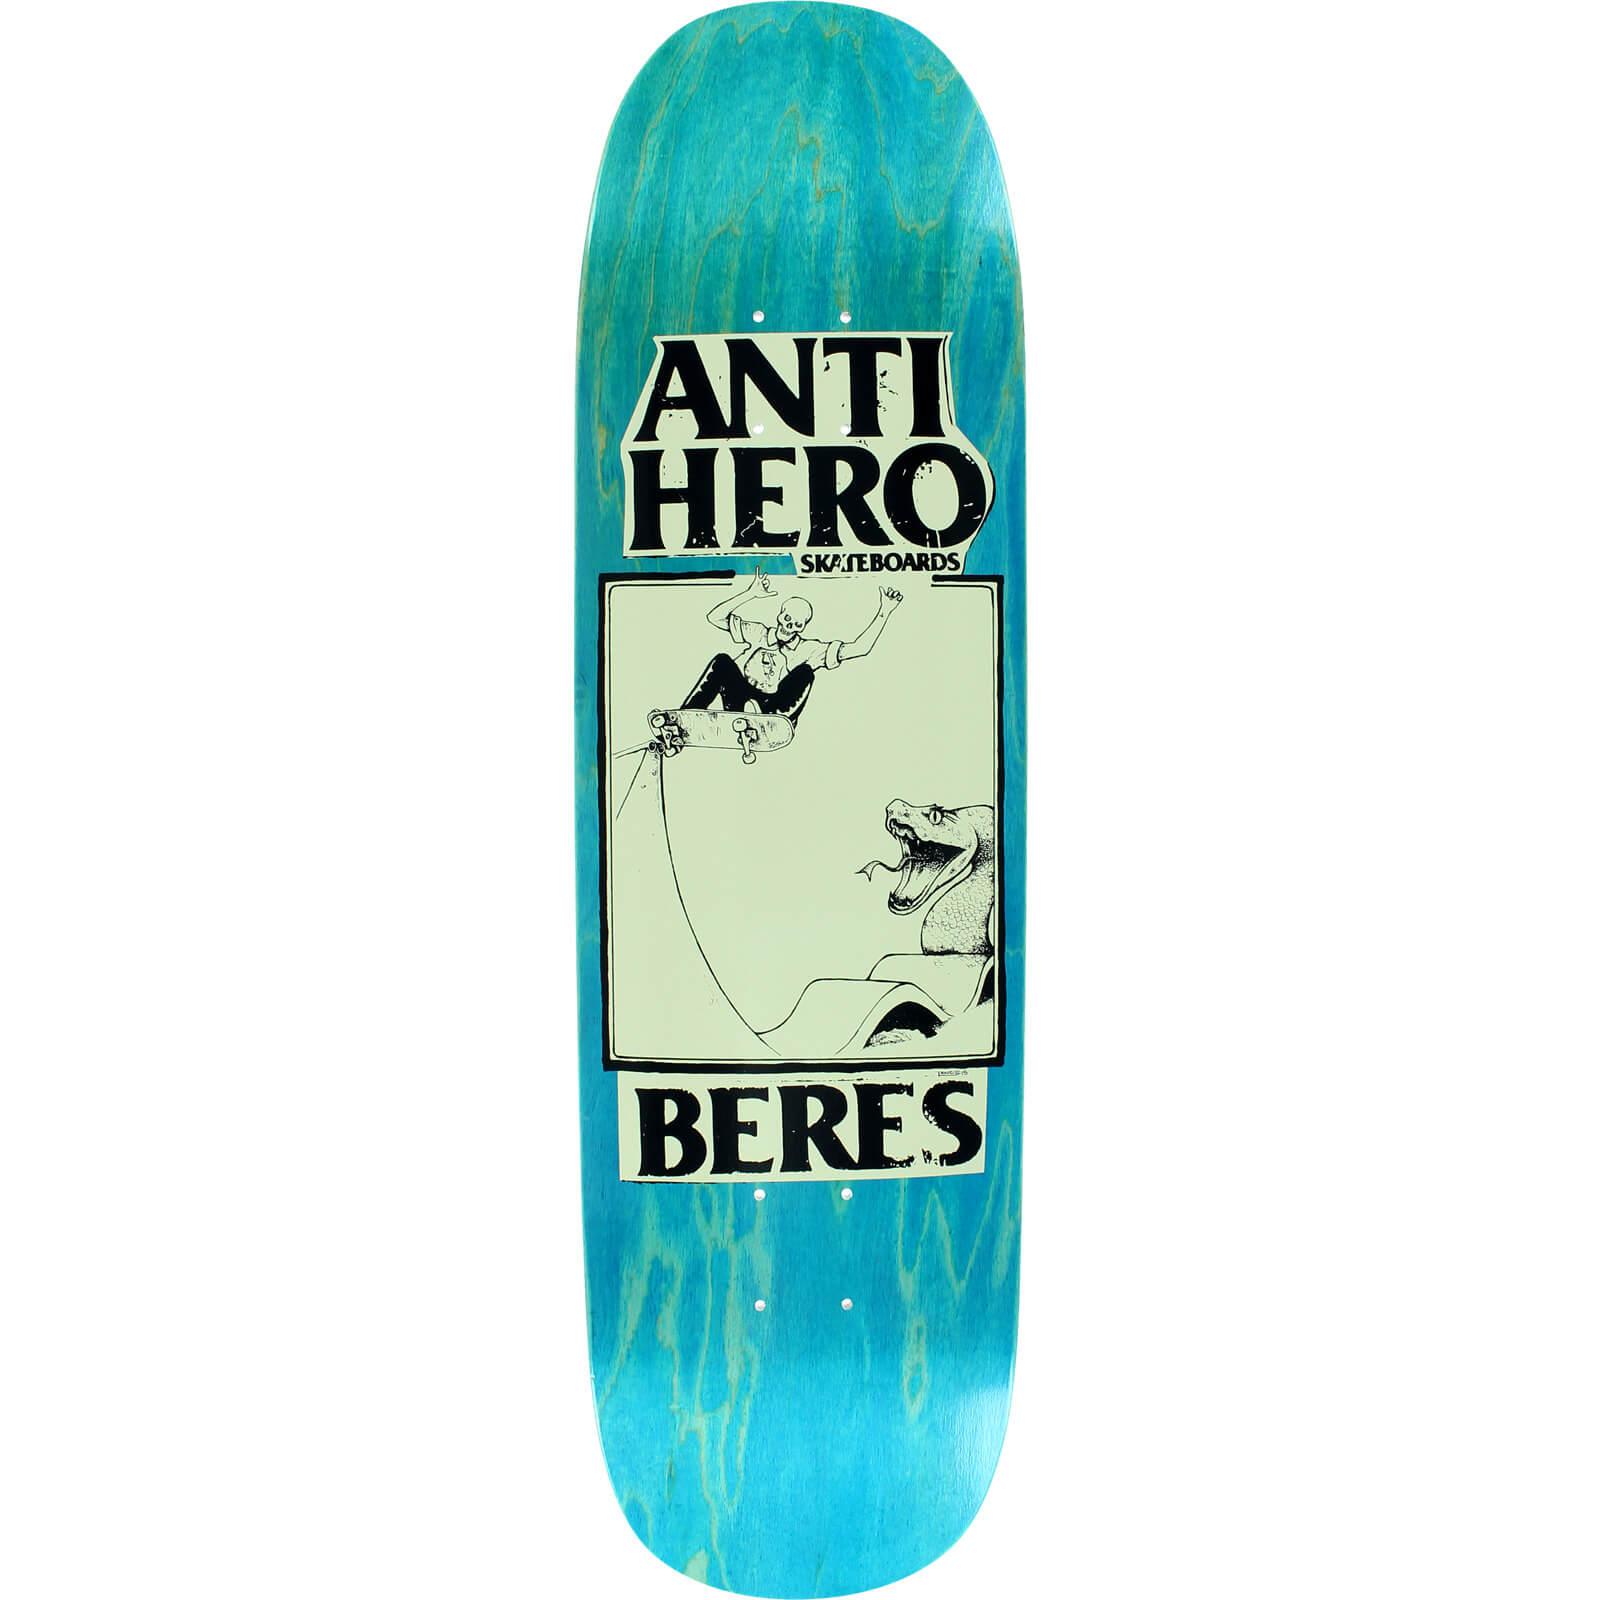 Anti Hero Skateboards Raney Beres Lance Mountain Guest Art